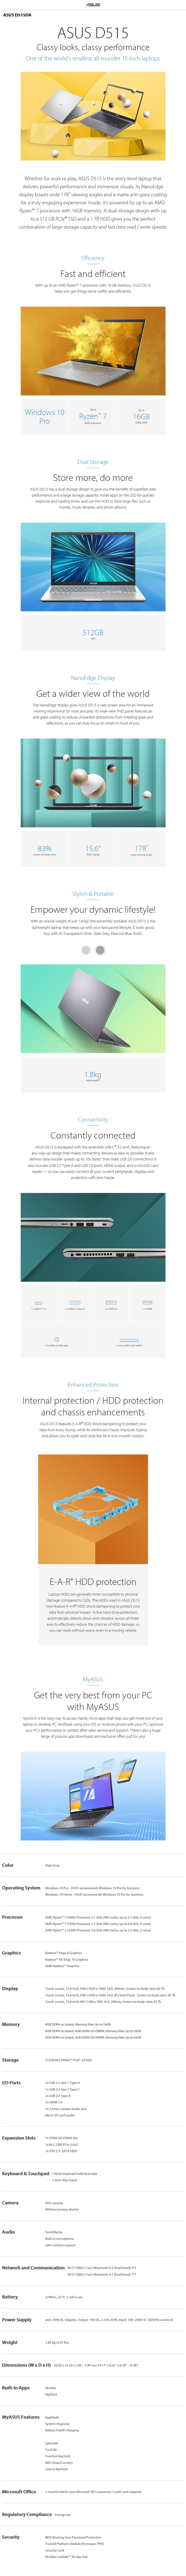 asus-d515dabq581r-156-laptop-amd-r73700u-8gb-512gb-win10-p-ac41547-6.jpg